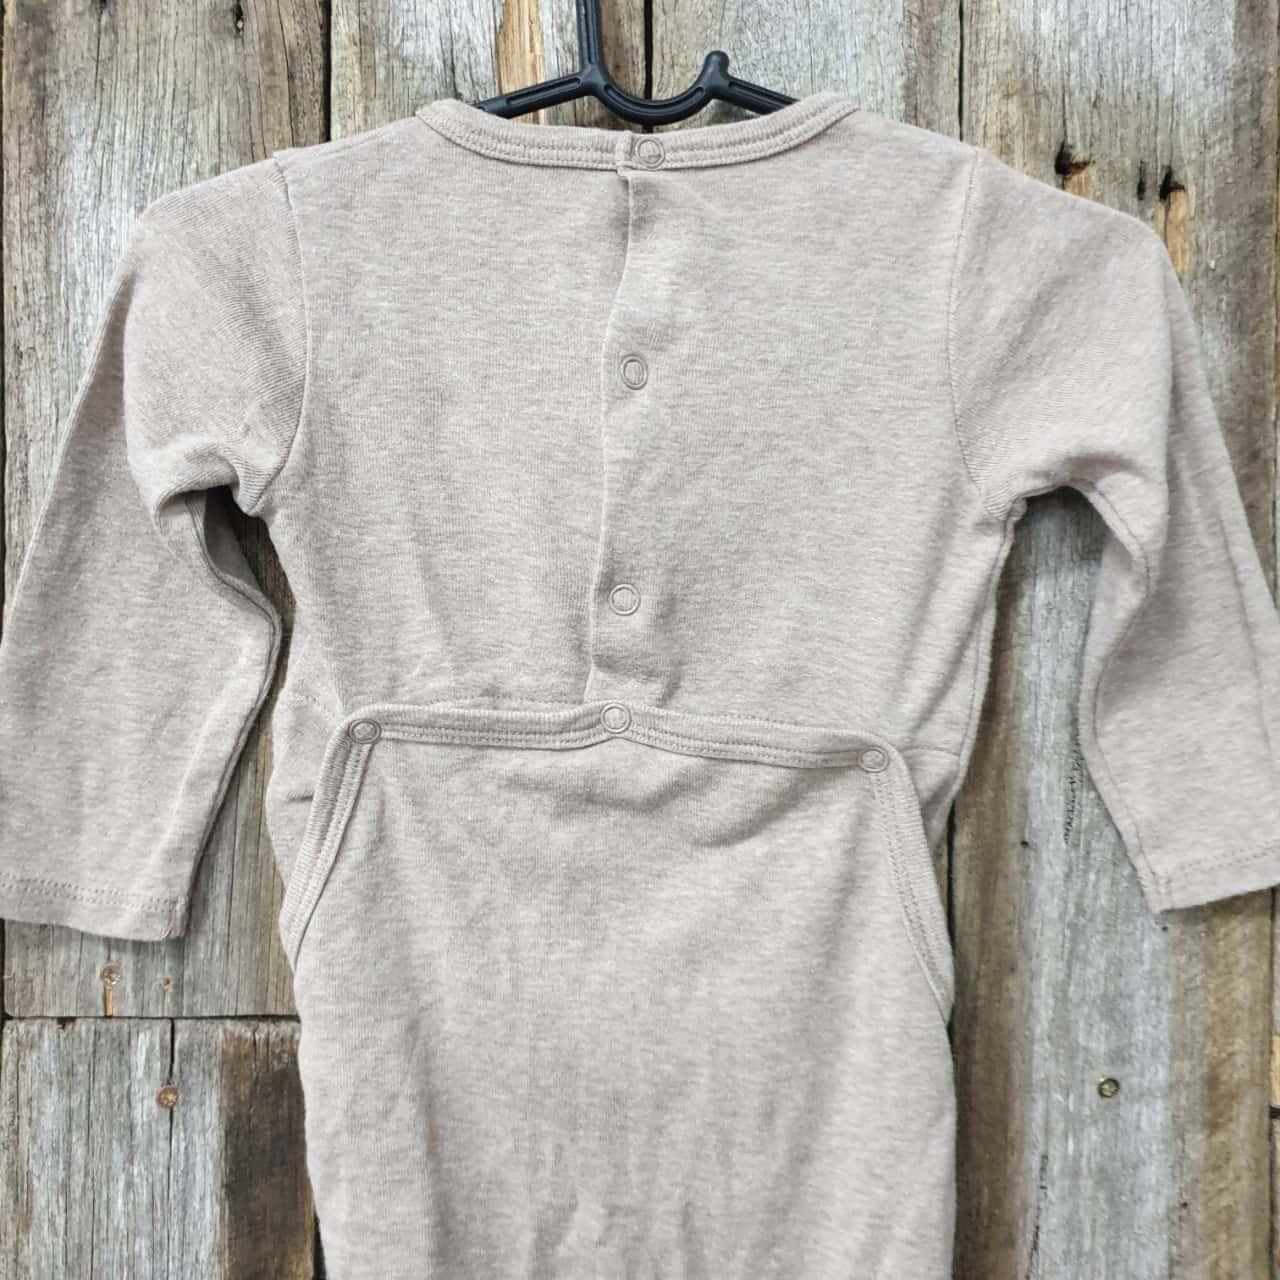 Baby's Seed Onesie Brown/White, Cotton, Size 3-6 months